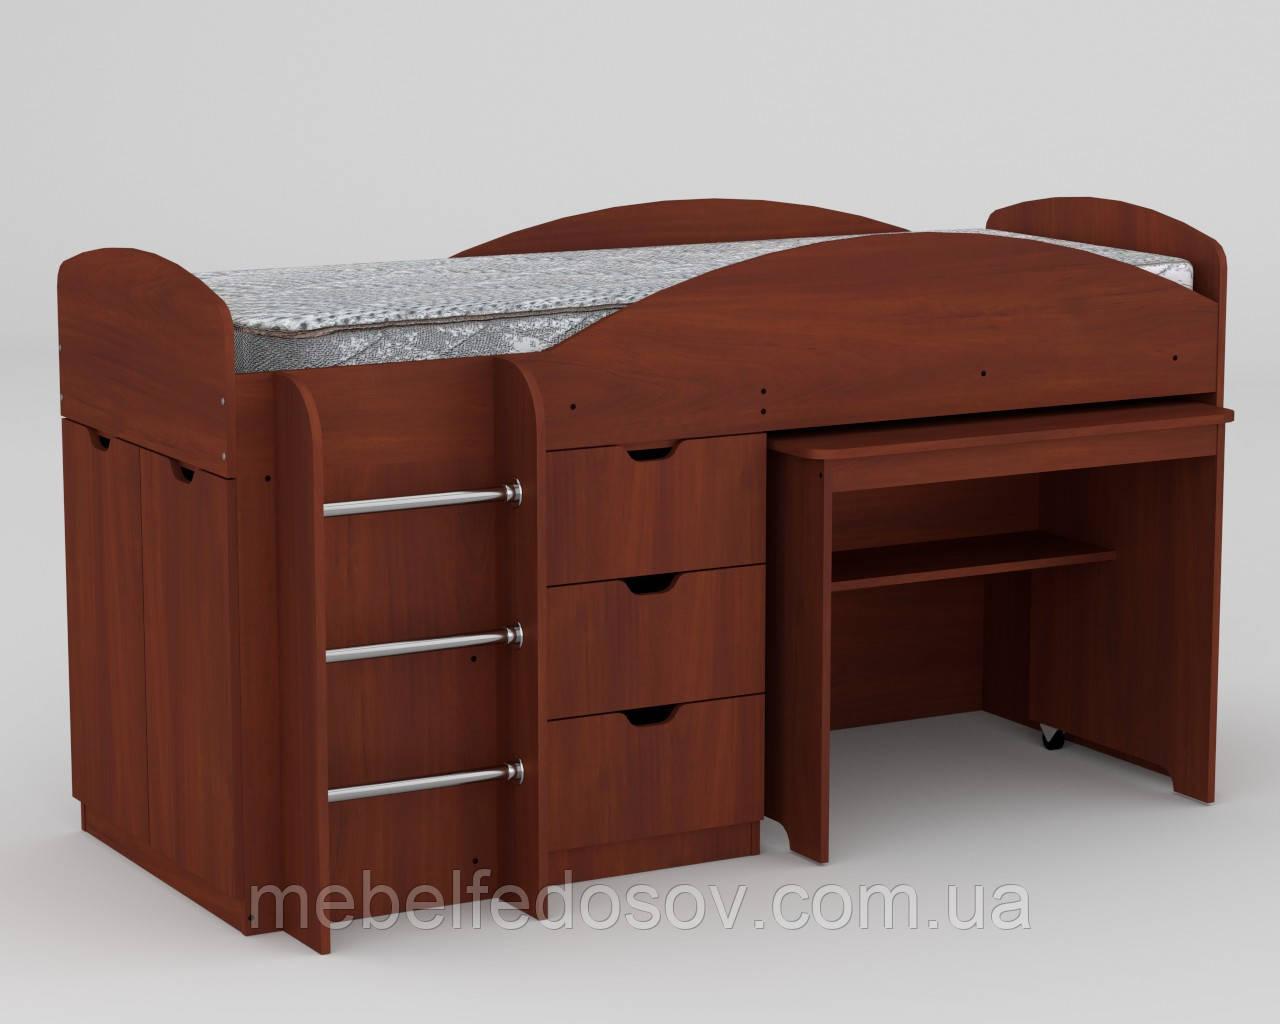 Универсал кровать чердак ДСП (Компанит) 892х1942х1060мм